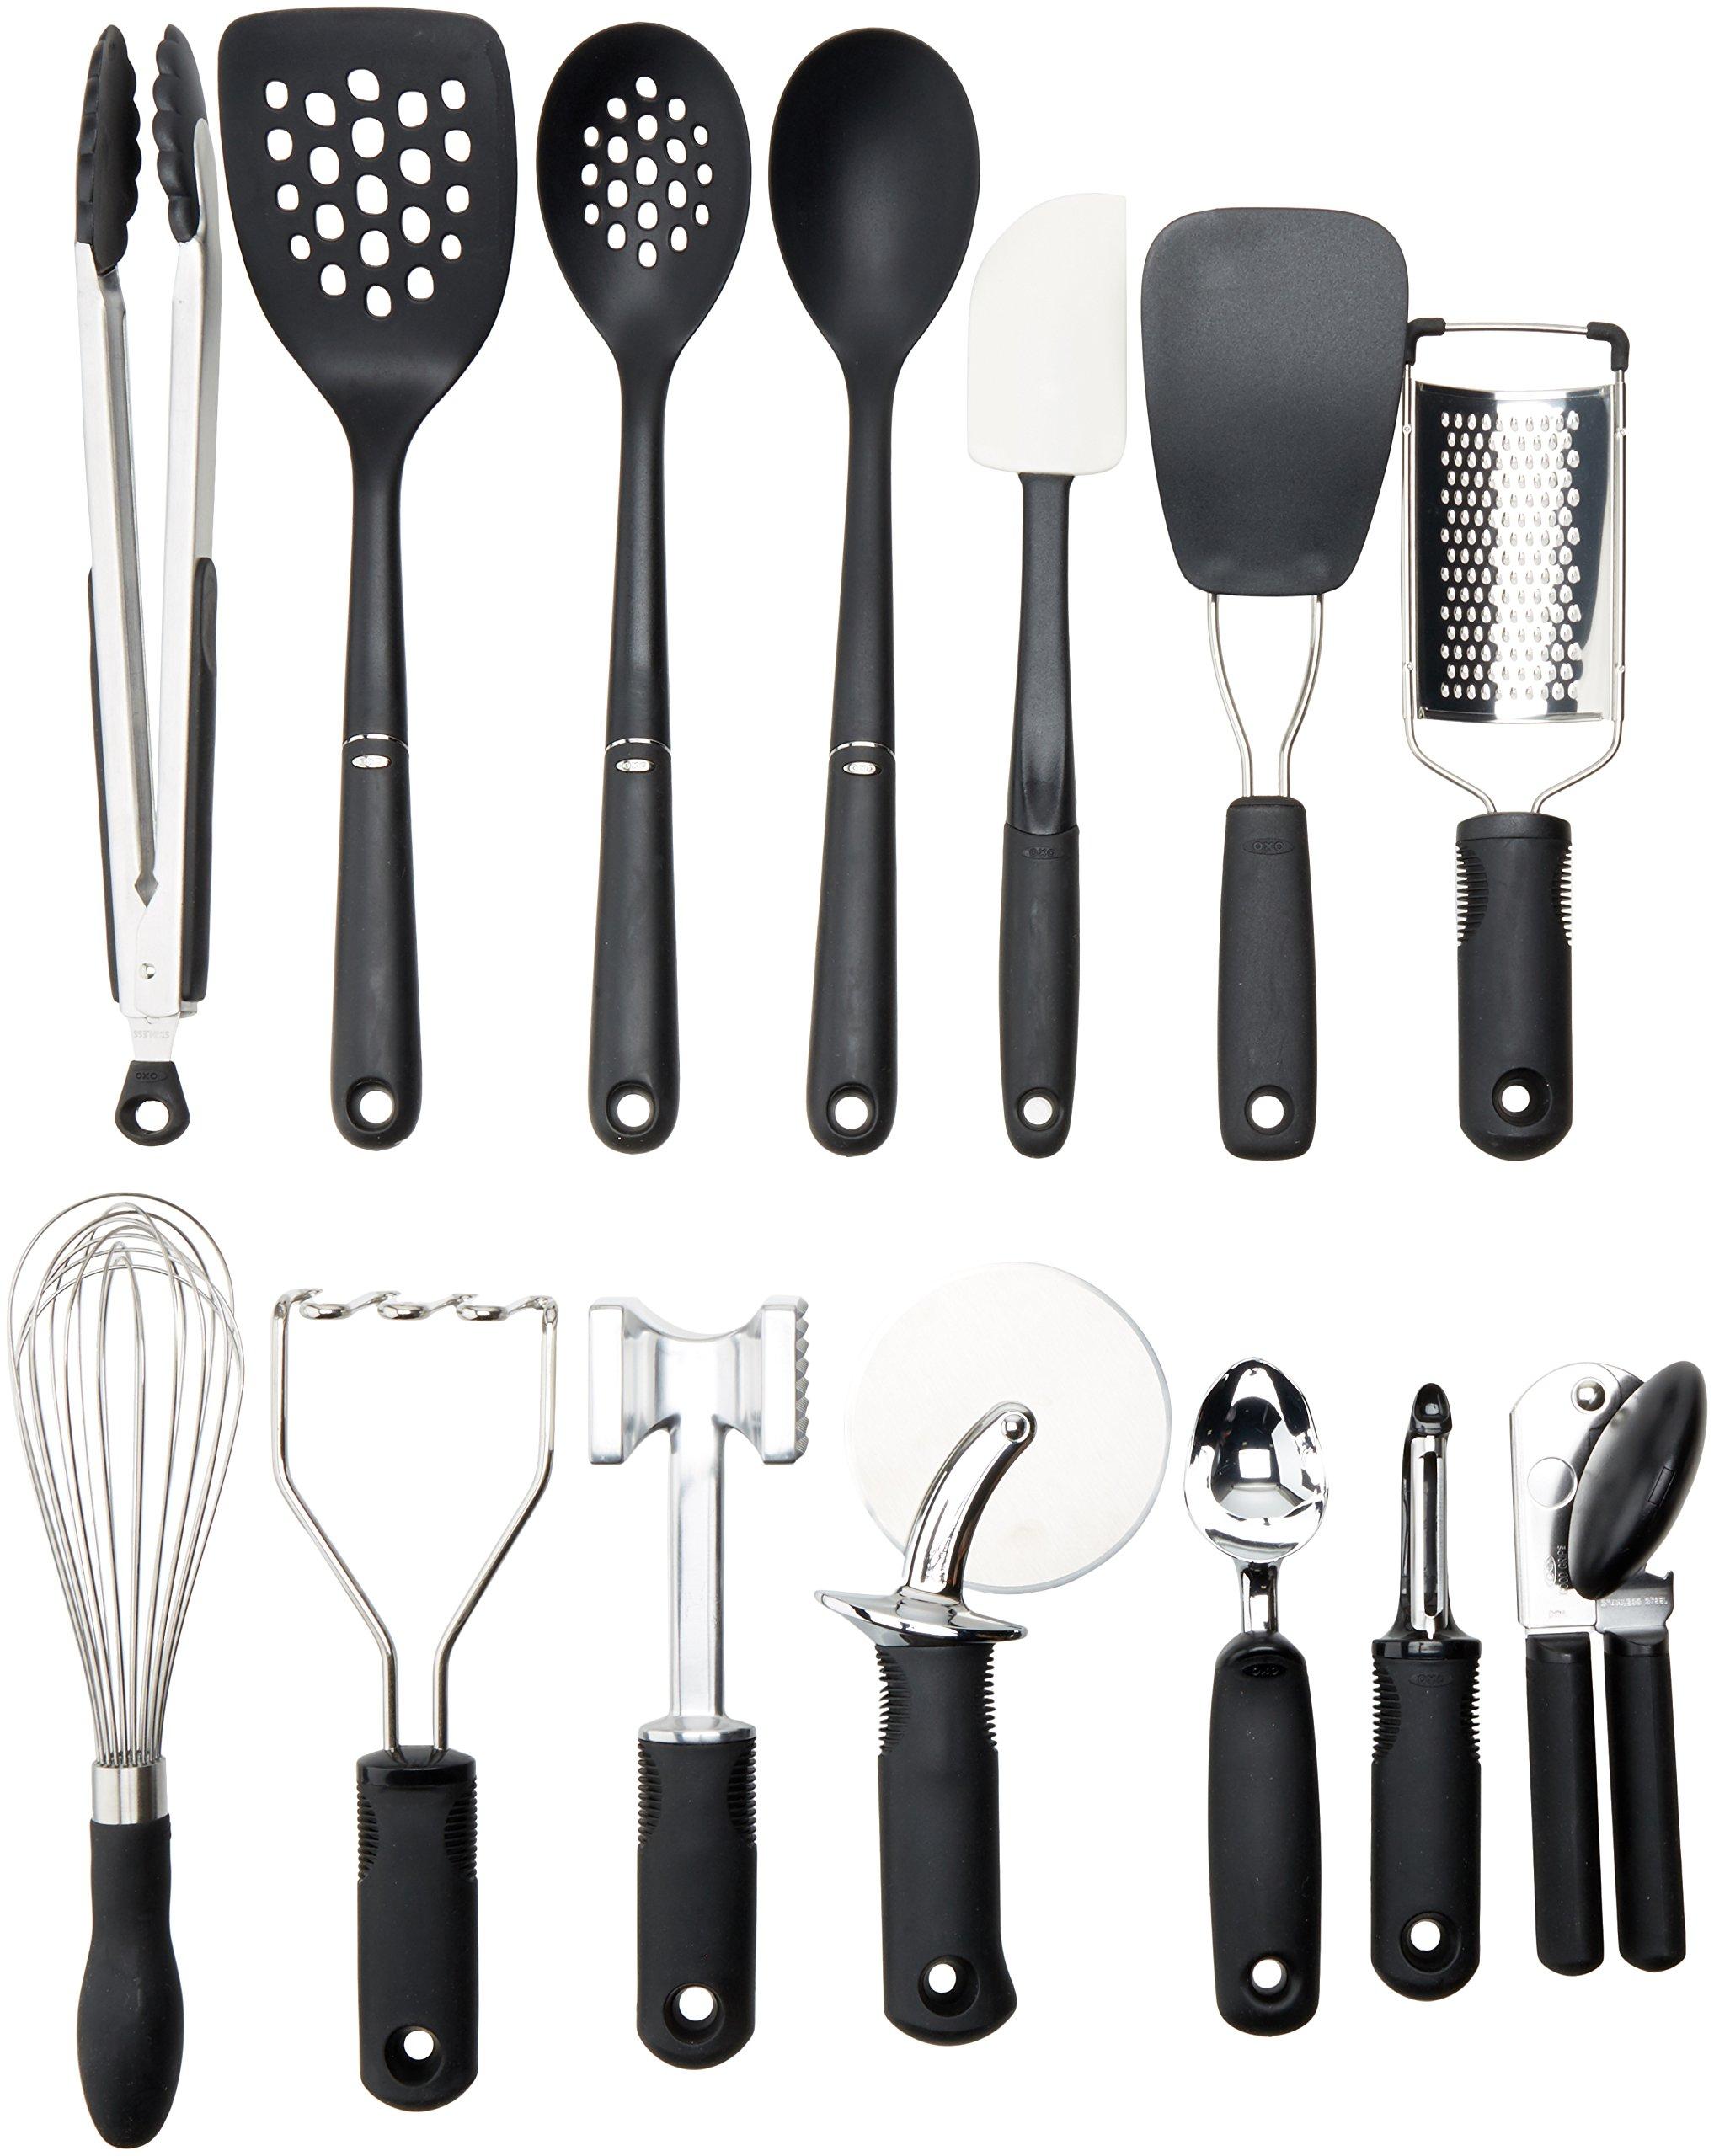 Galleon Oxo Good Grips 15 Piece Everyday Kitchen Tool Set